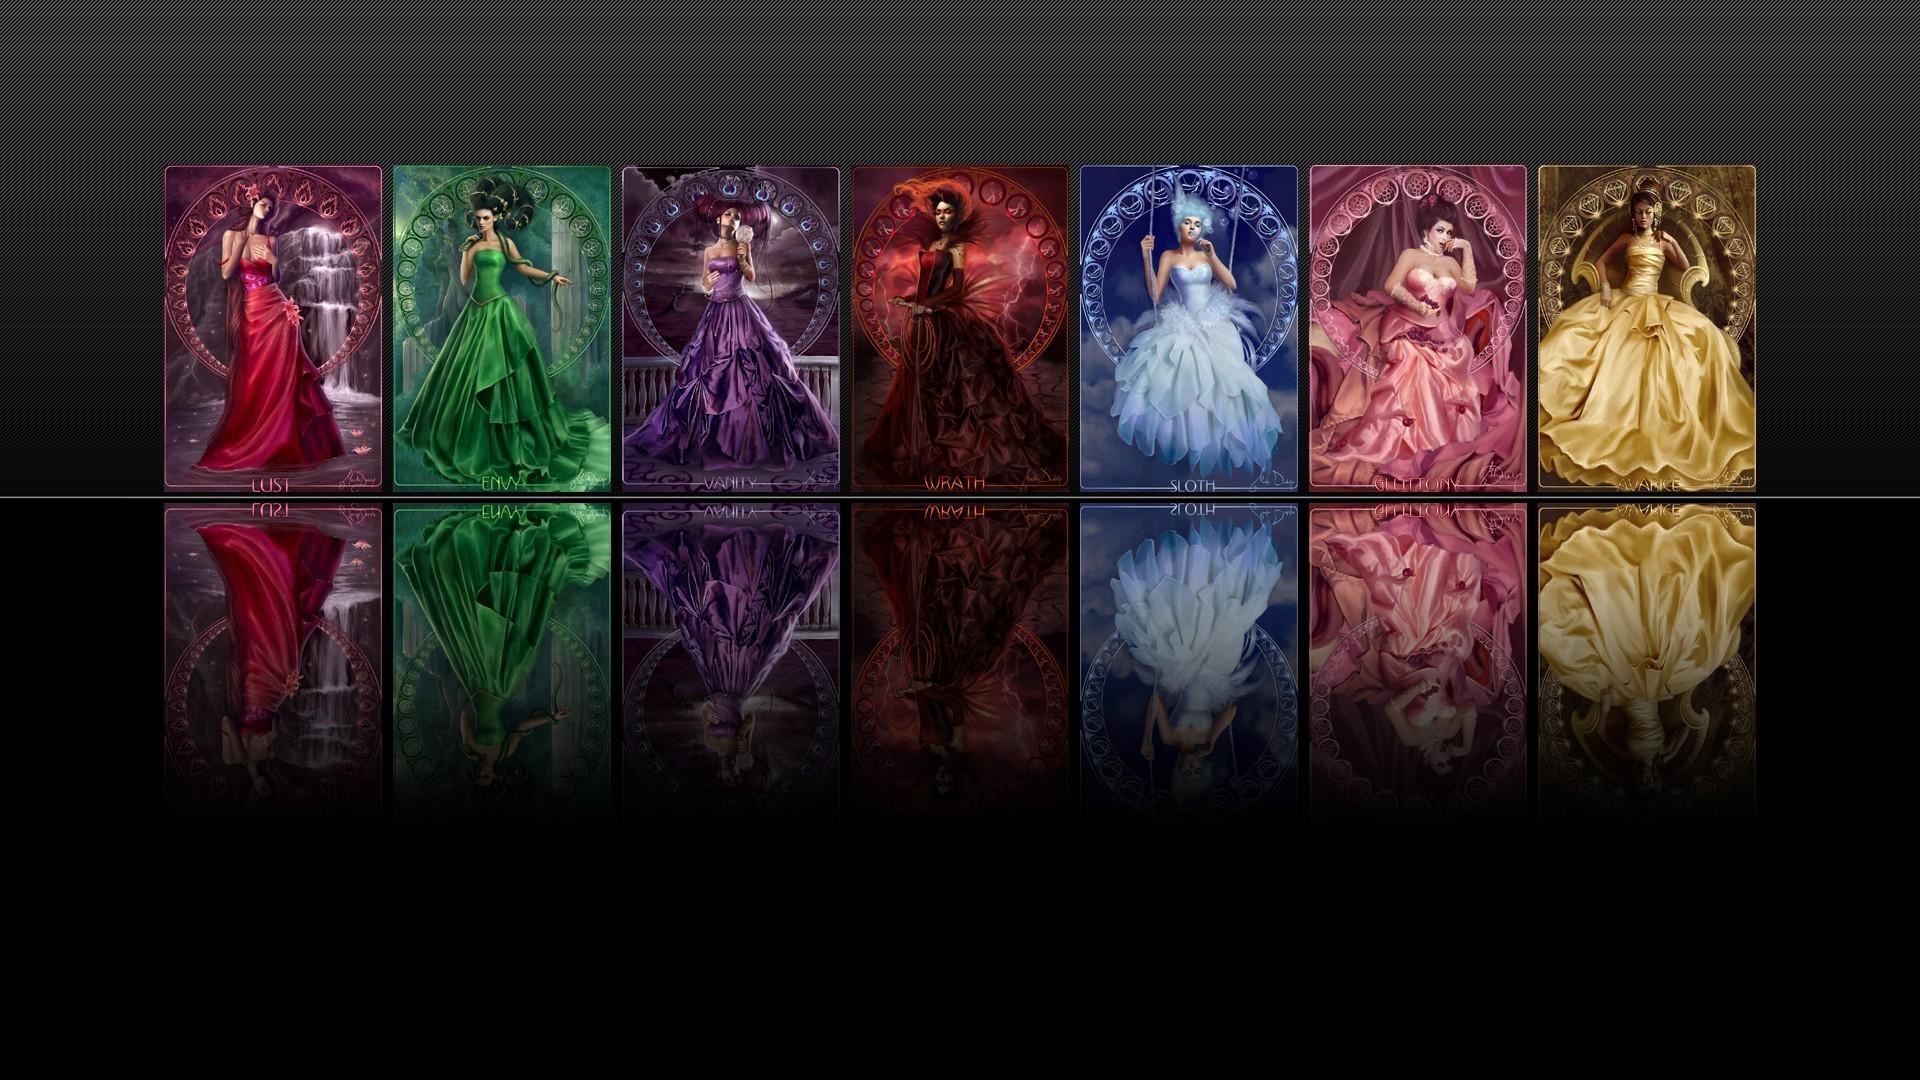 Nanatsu No Taizai wallpaper ·① Download free amazing full ...